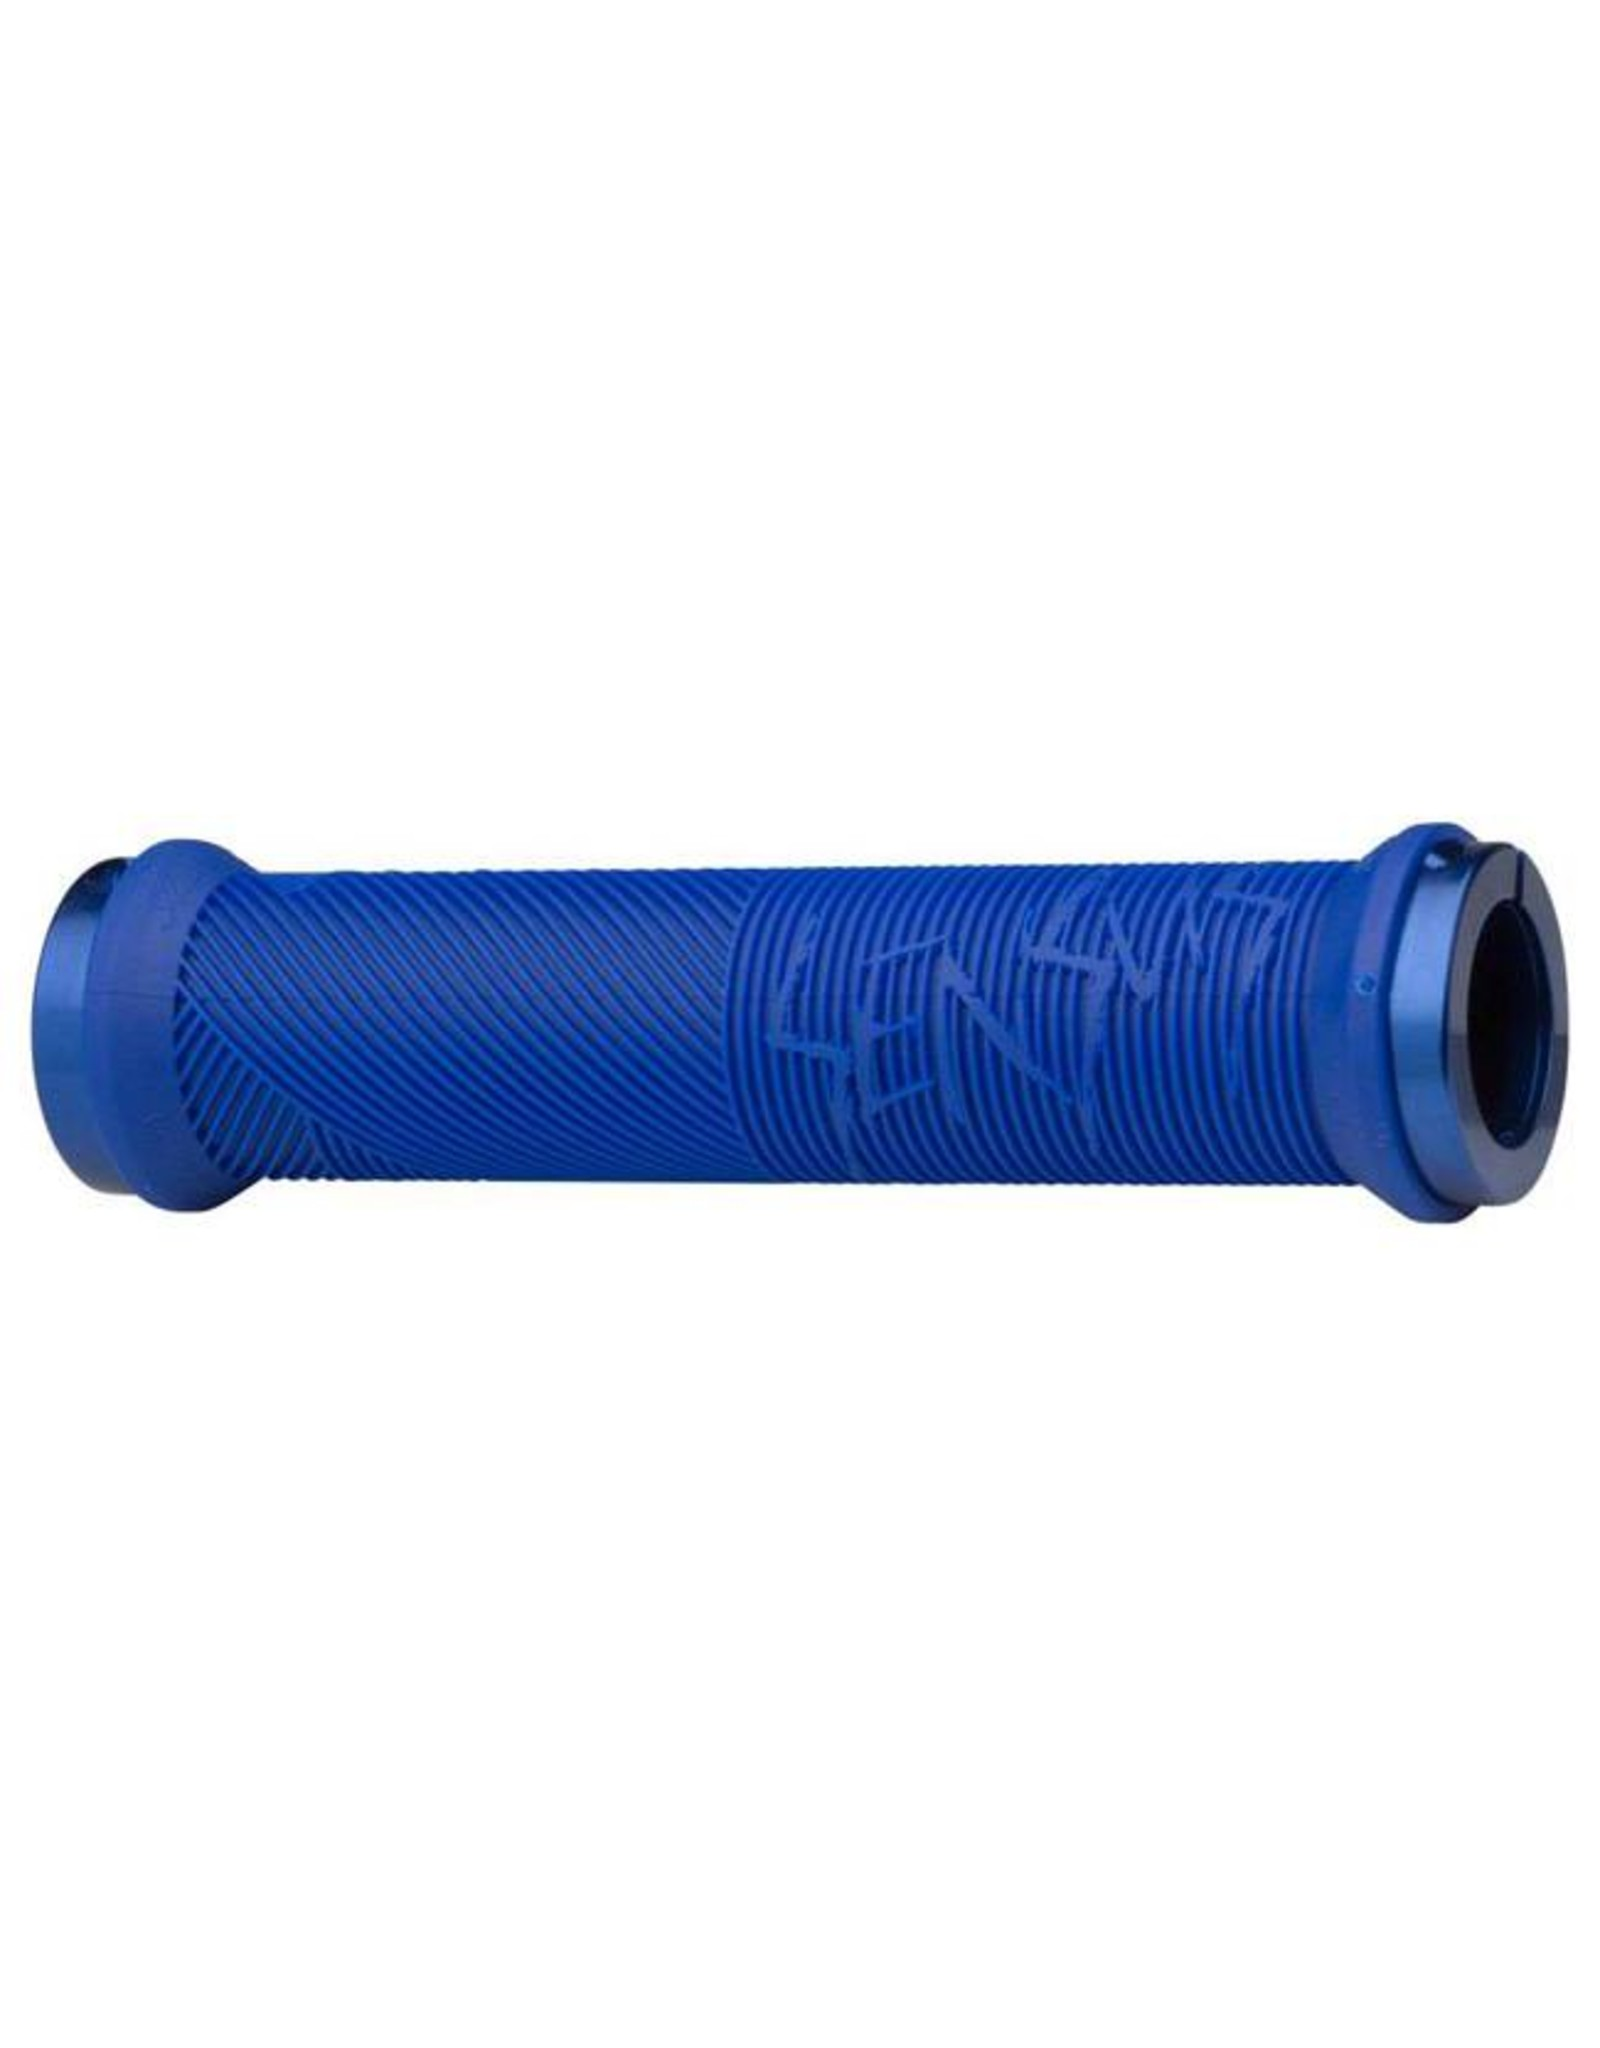 ODI ODI Sensus Disisdaboss Lock-On Grips 143mm Bright Blue